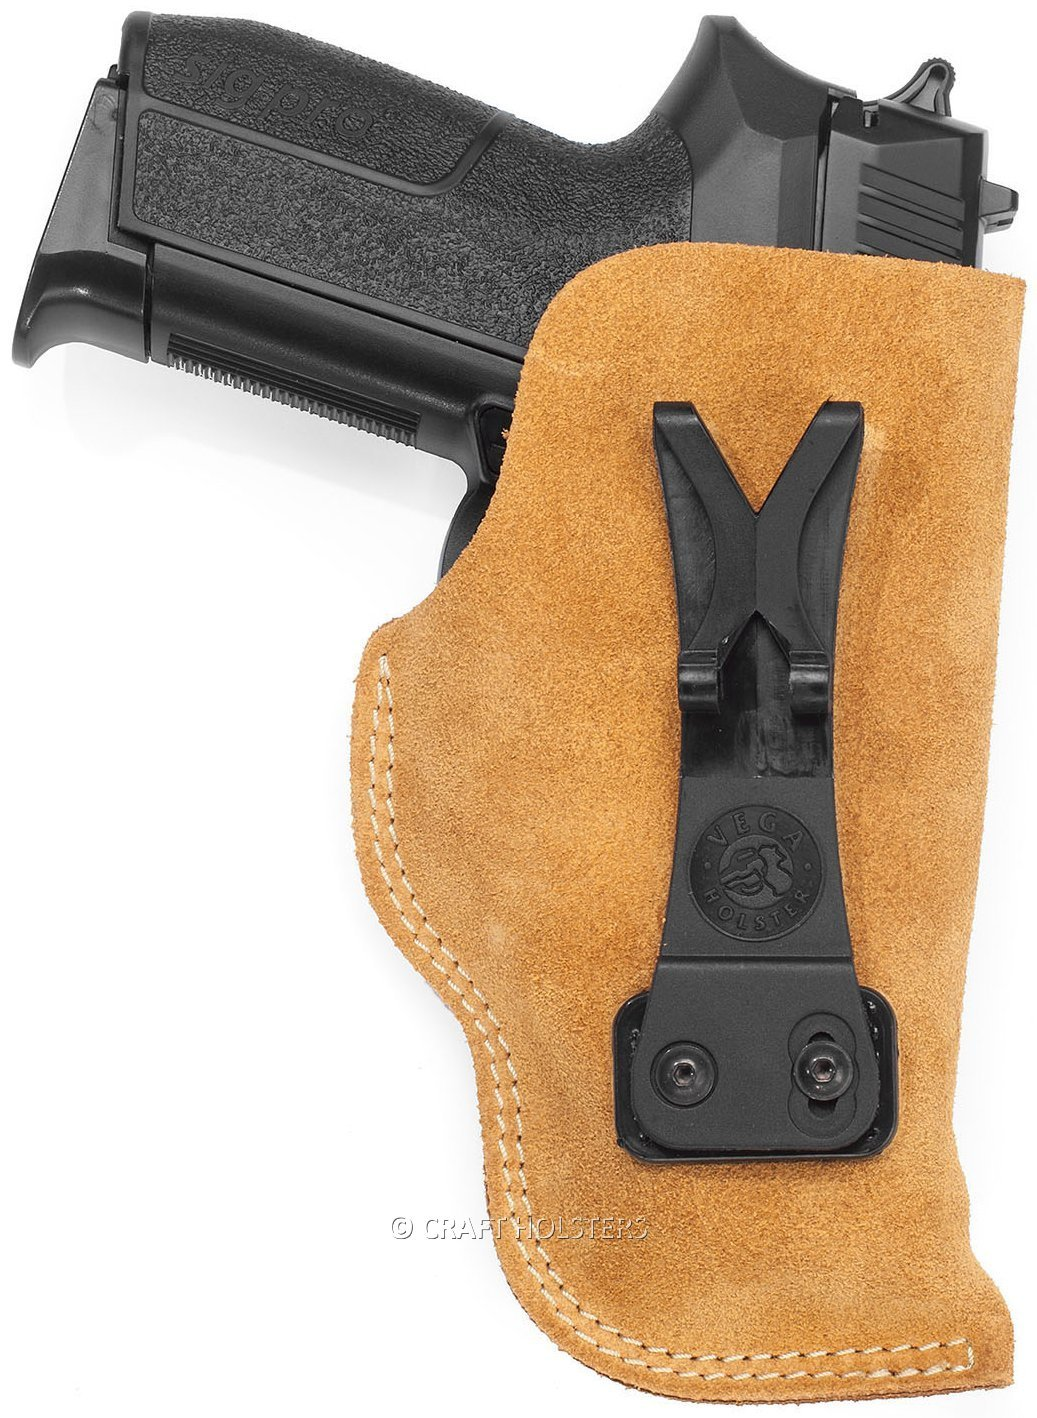 Amazon com : Colt Anaconda Leather Tuckable Holster : Sports